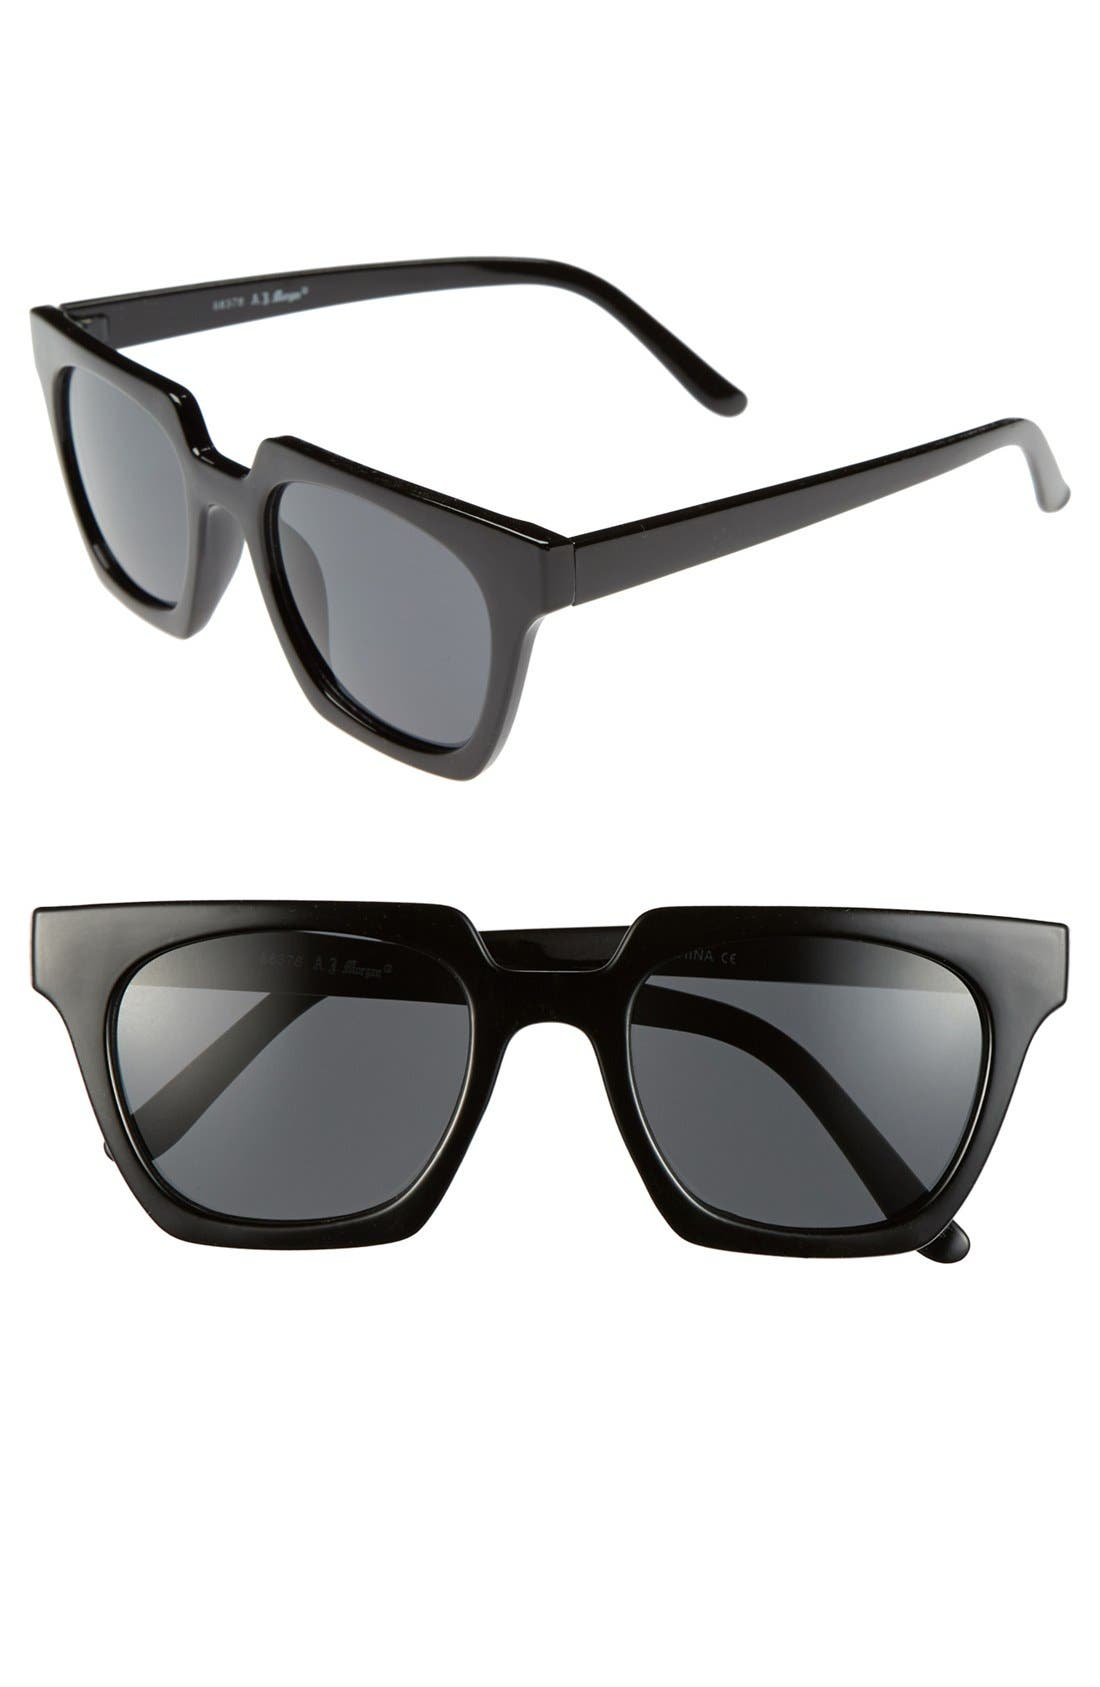 Main Image - A.J. Morgan 'Geo' 50mm Sunglasses